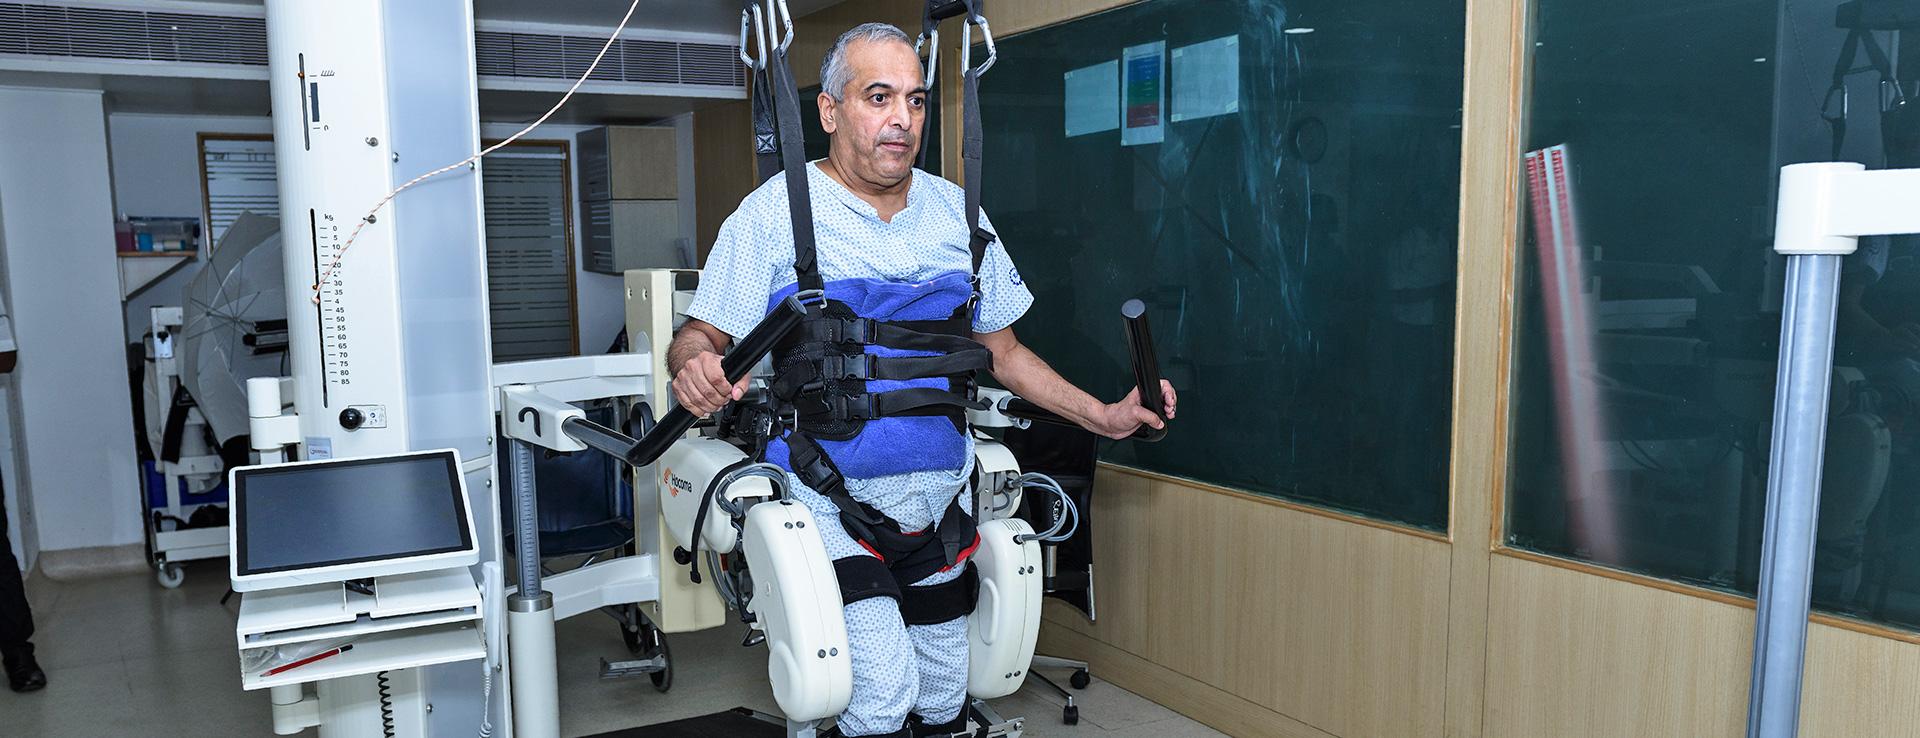 Musculoskeletal Rehabilitation